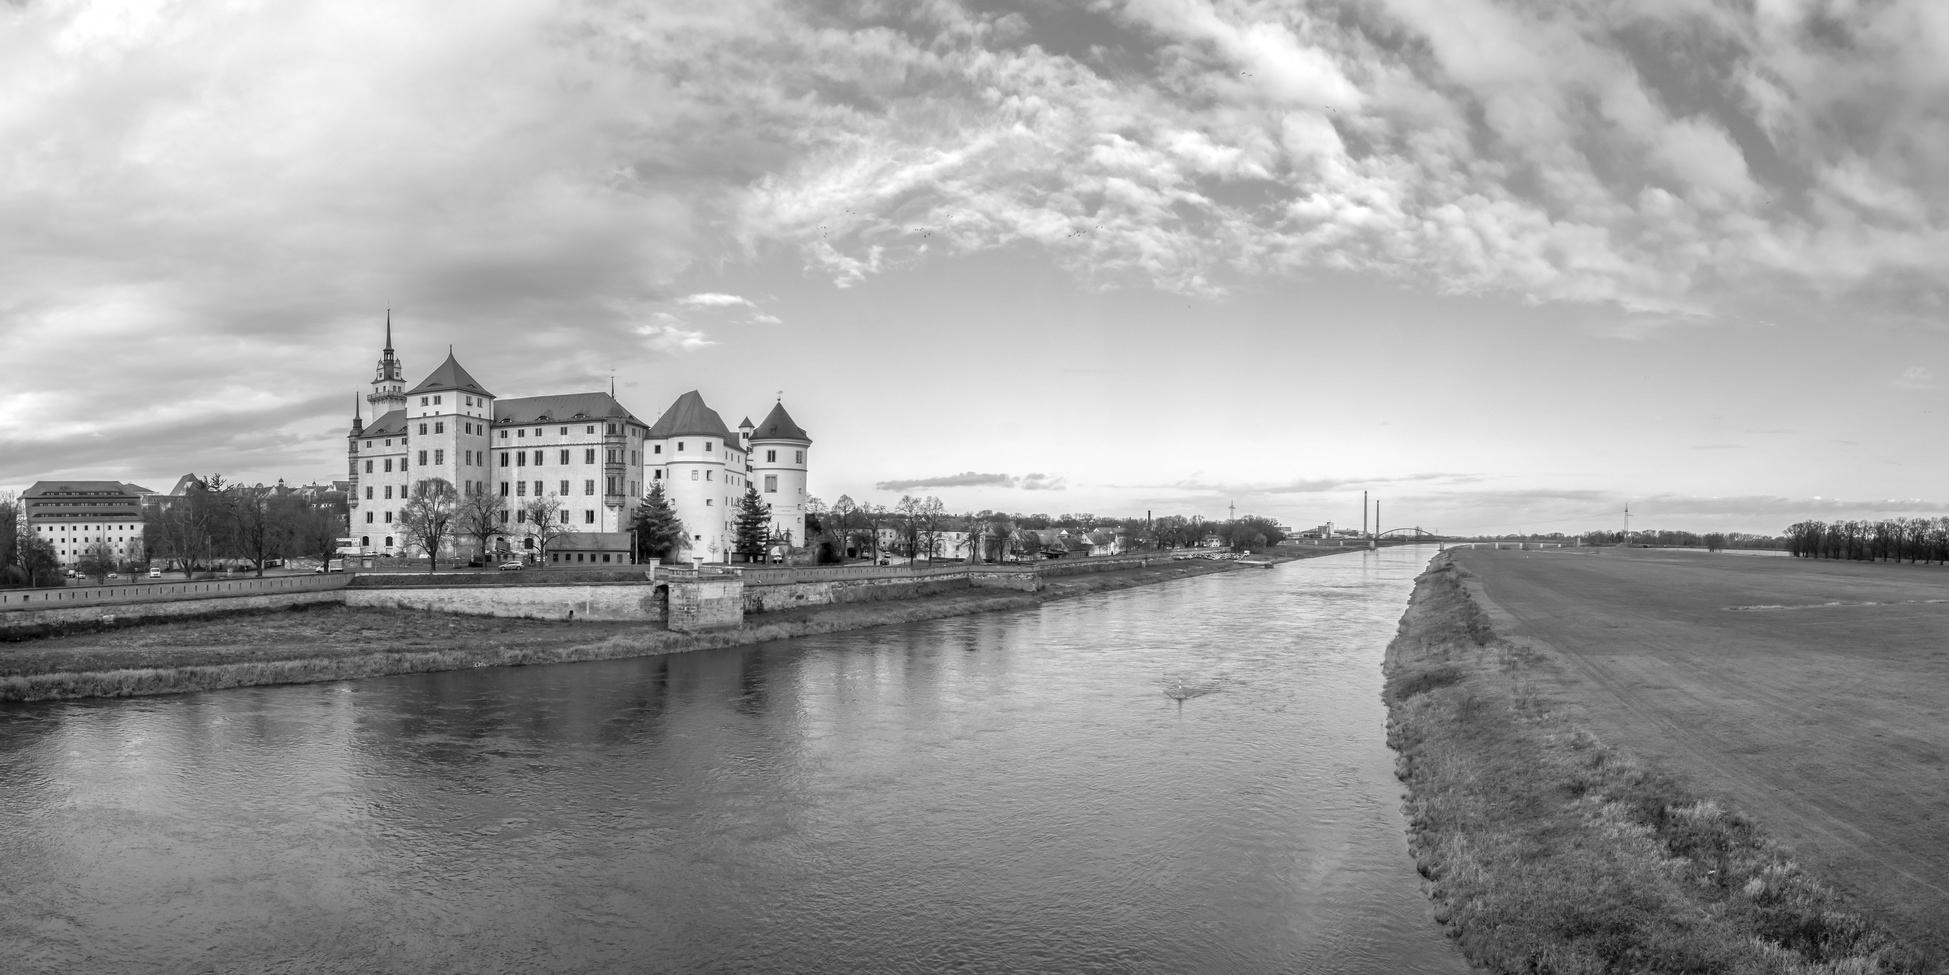 Torgau, Schloß Hartenfels